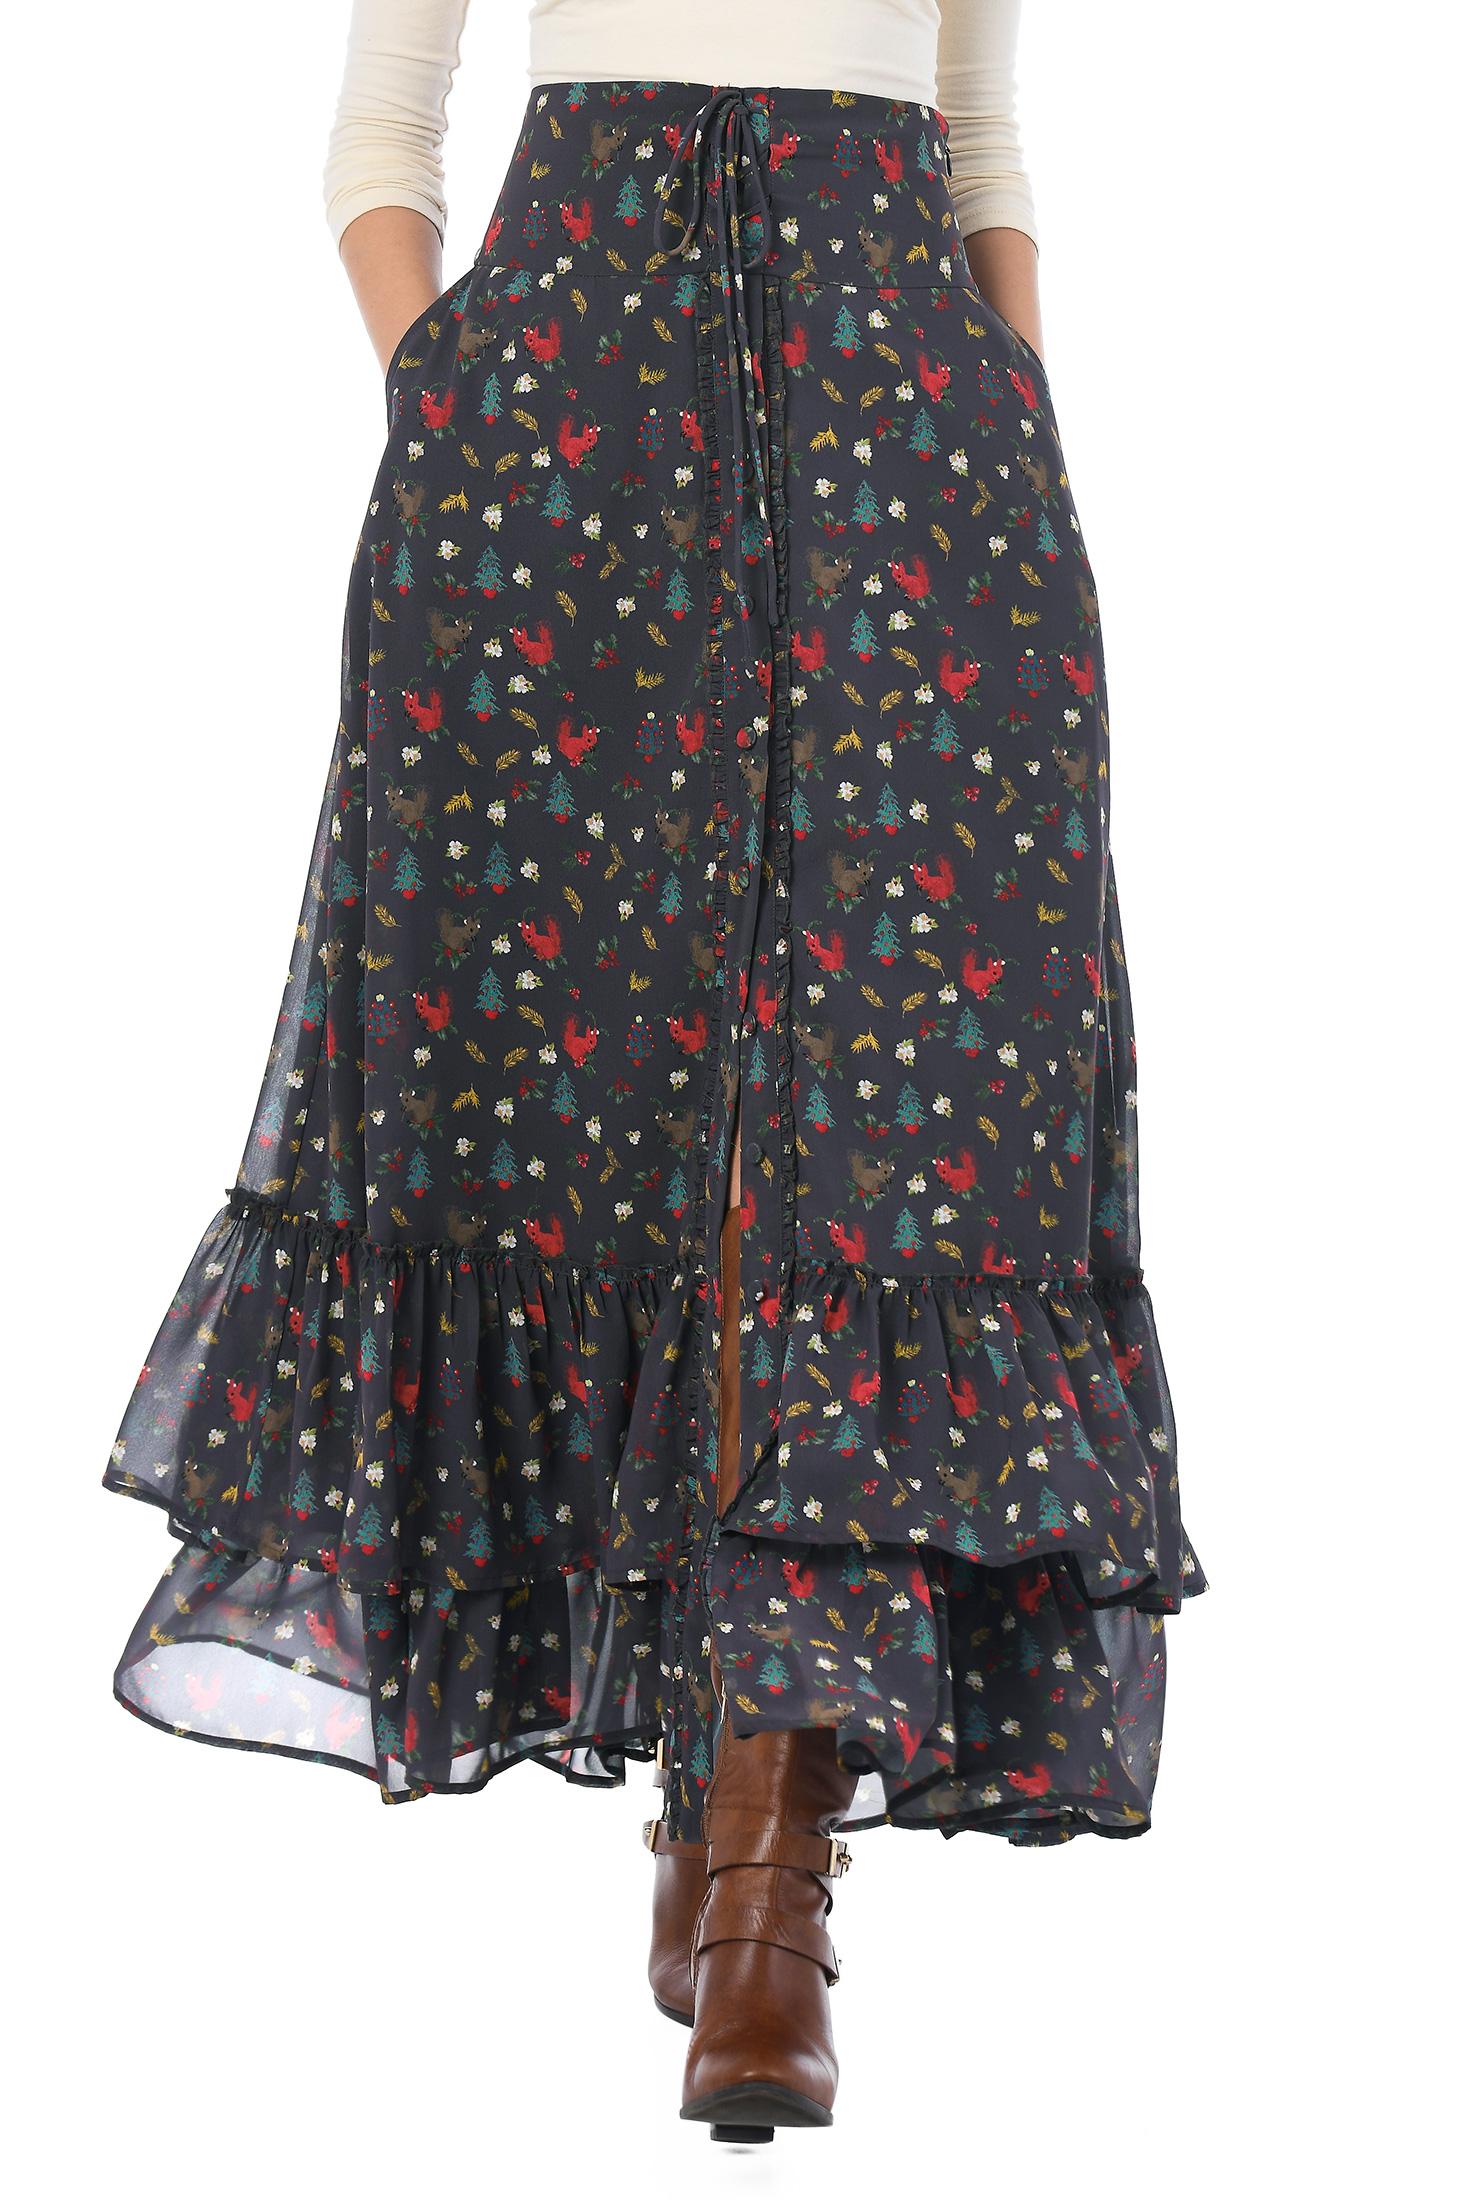 dc5efbdfdb835 Women s Fashion Clothing 0-36W and Custom